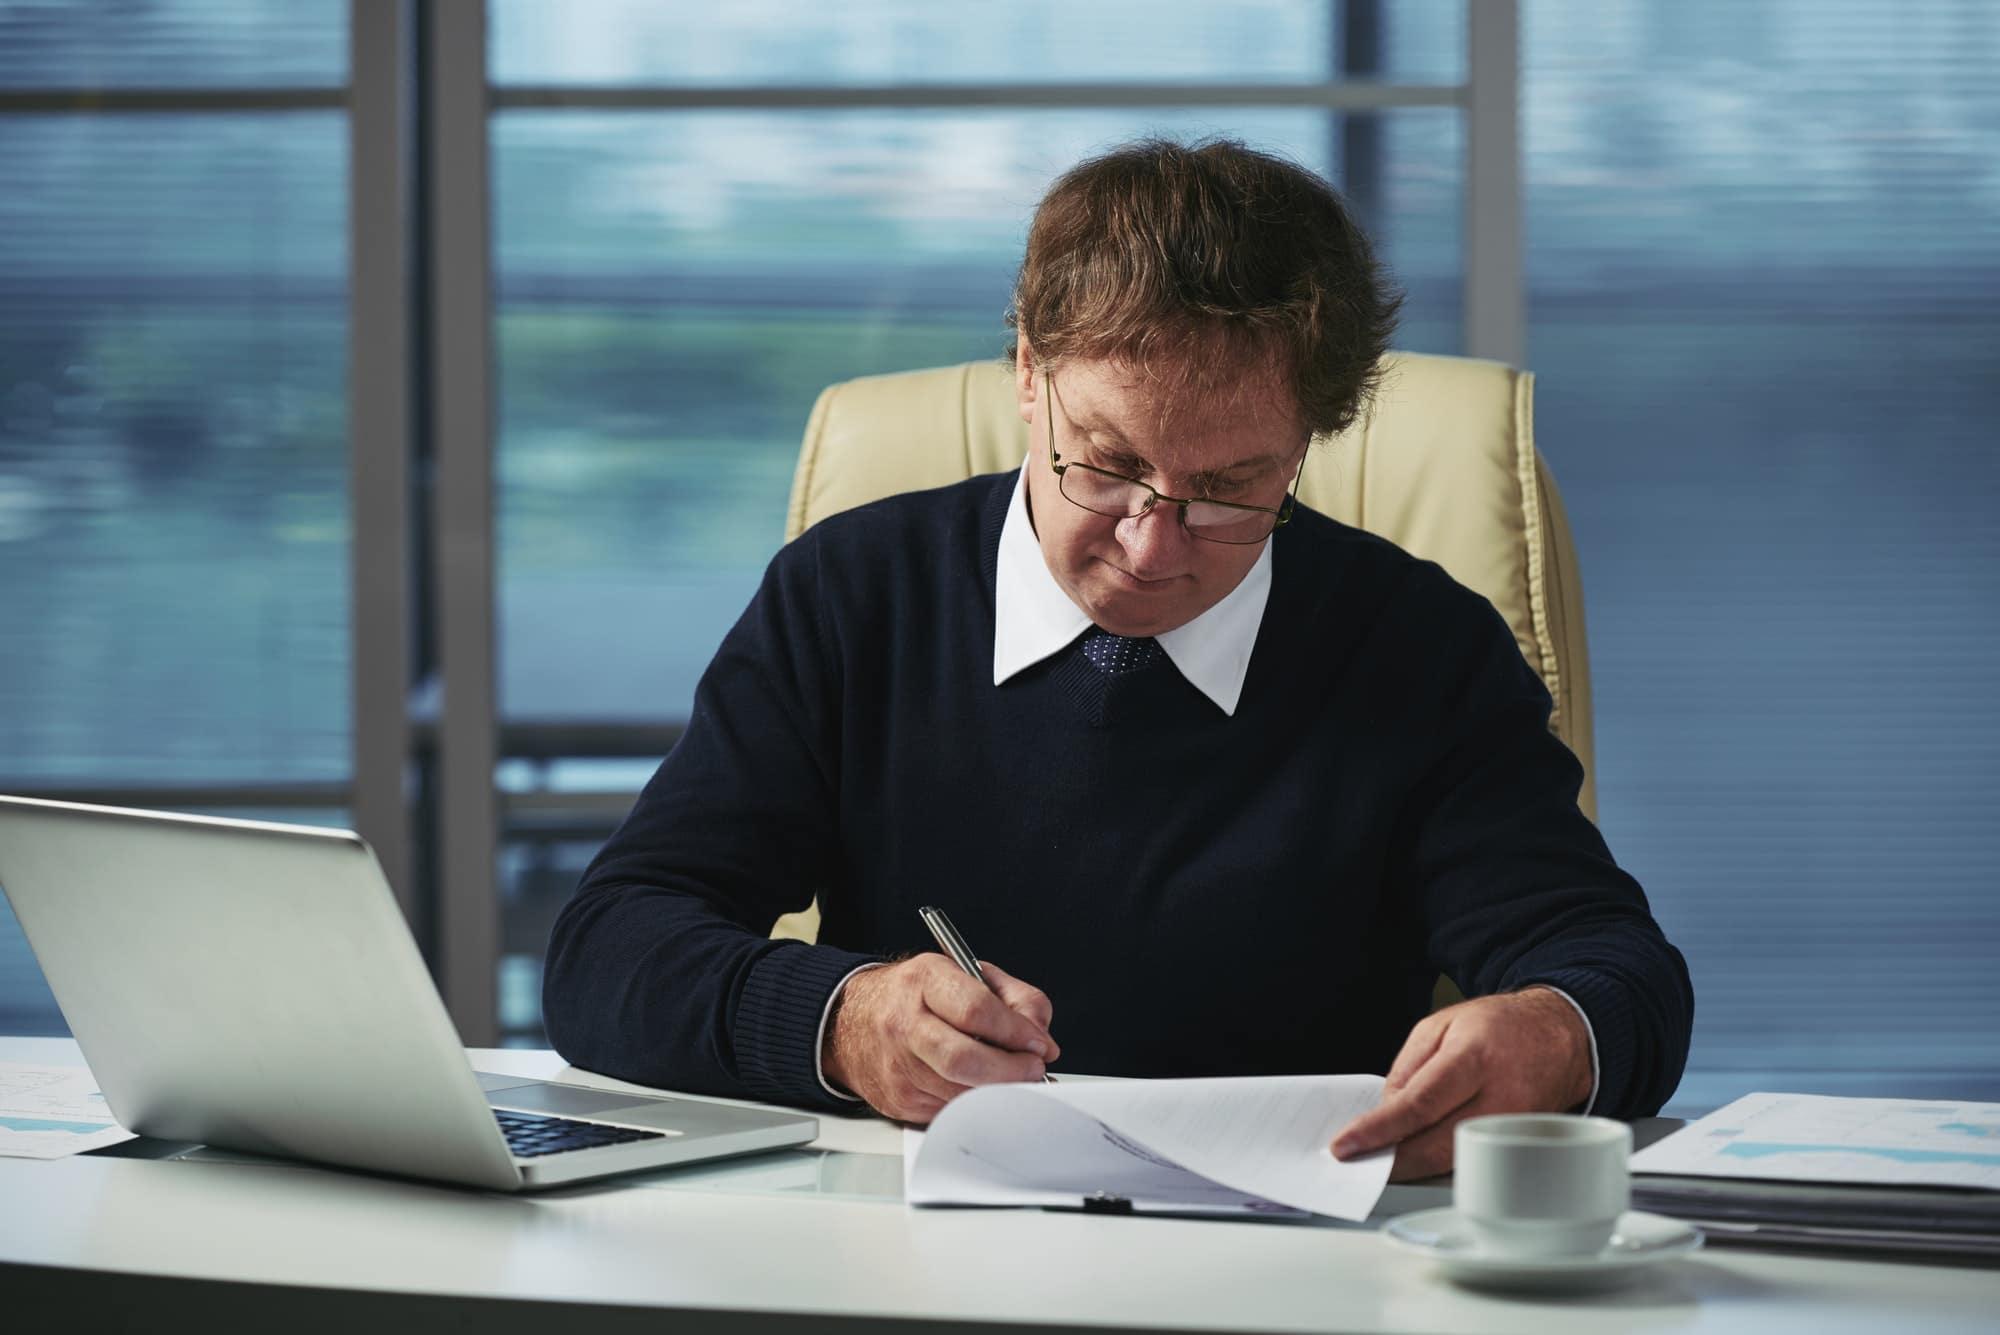 Man at desk working on paperwork